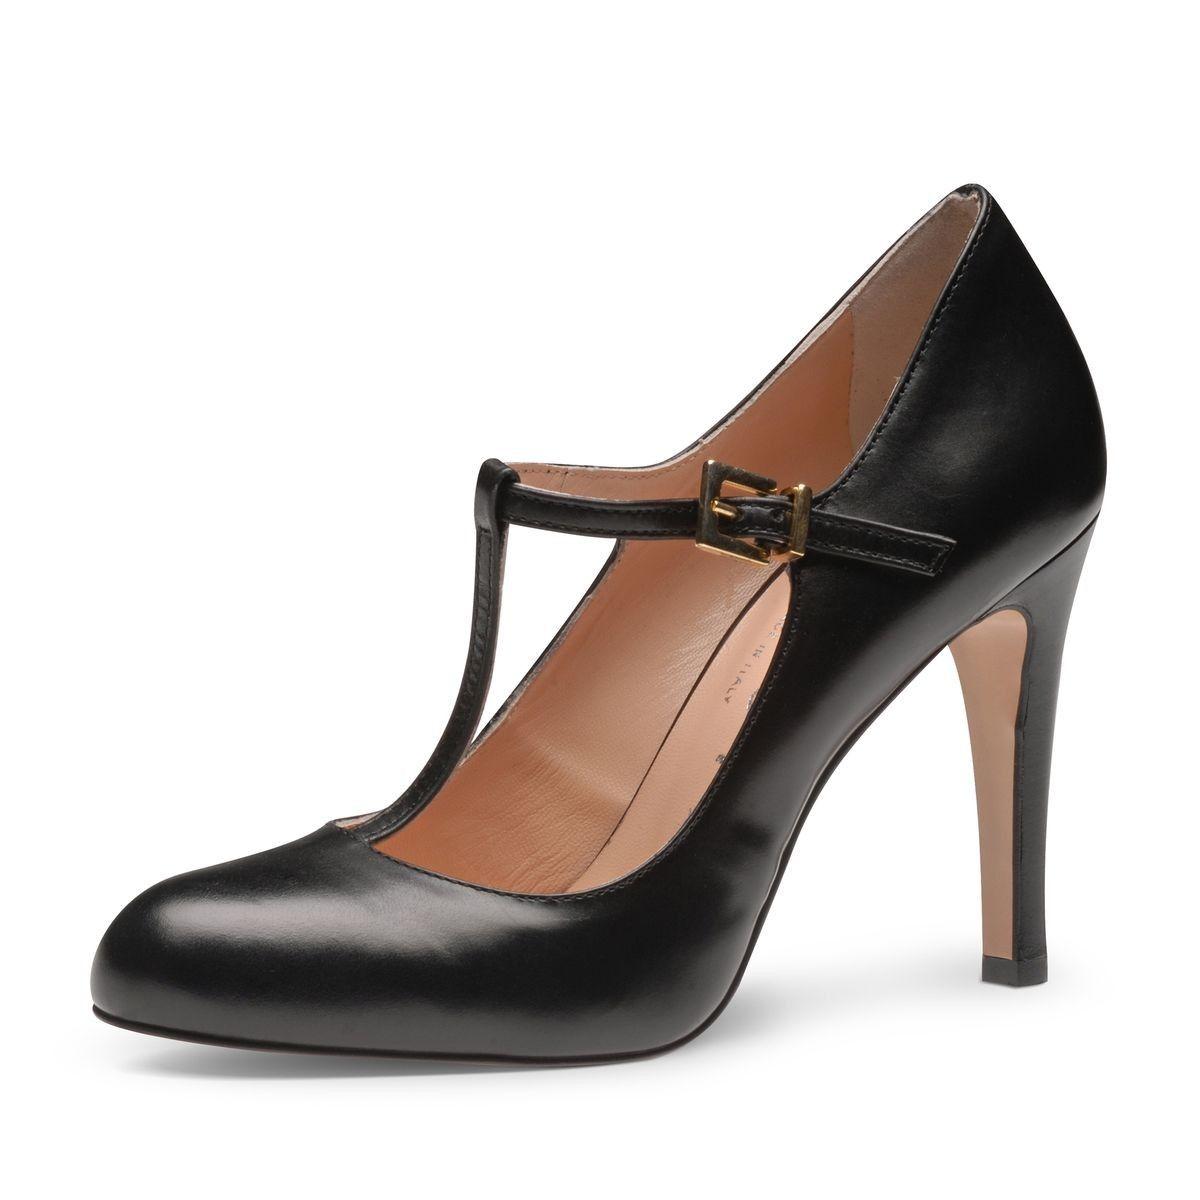 Pompes Chaussures Rosa Evita QdPWwJYMw